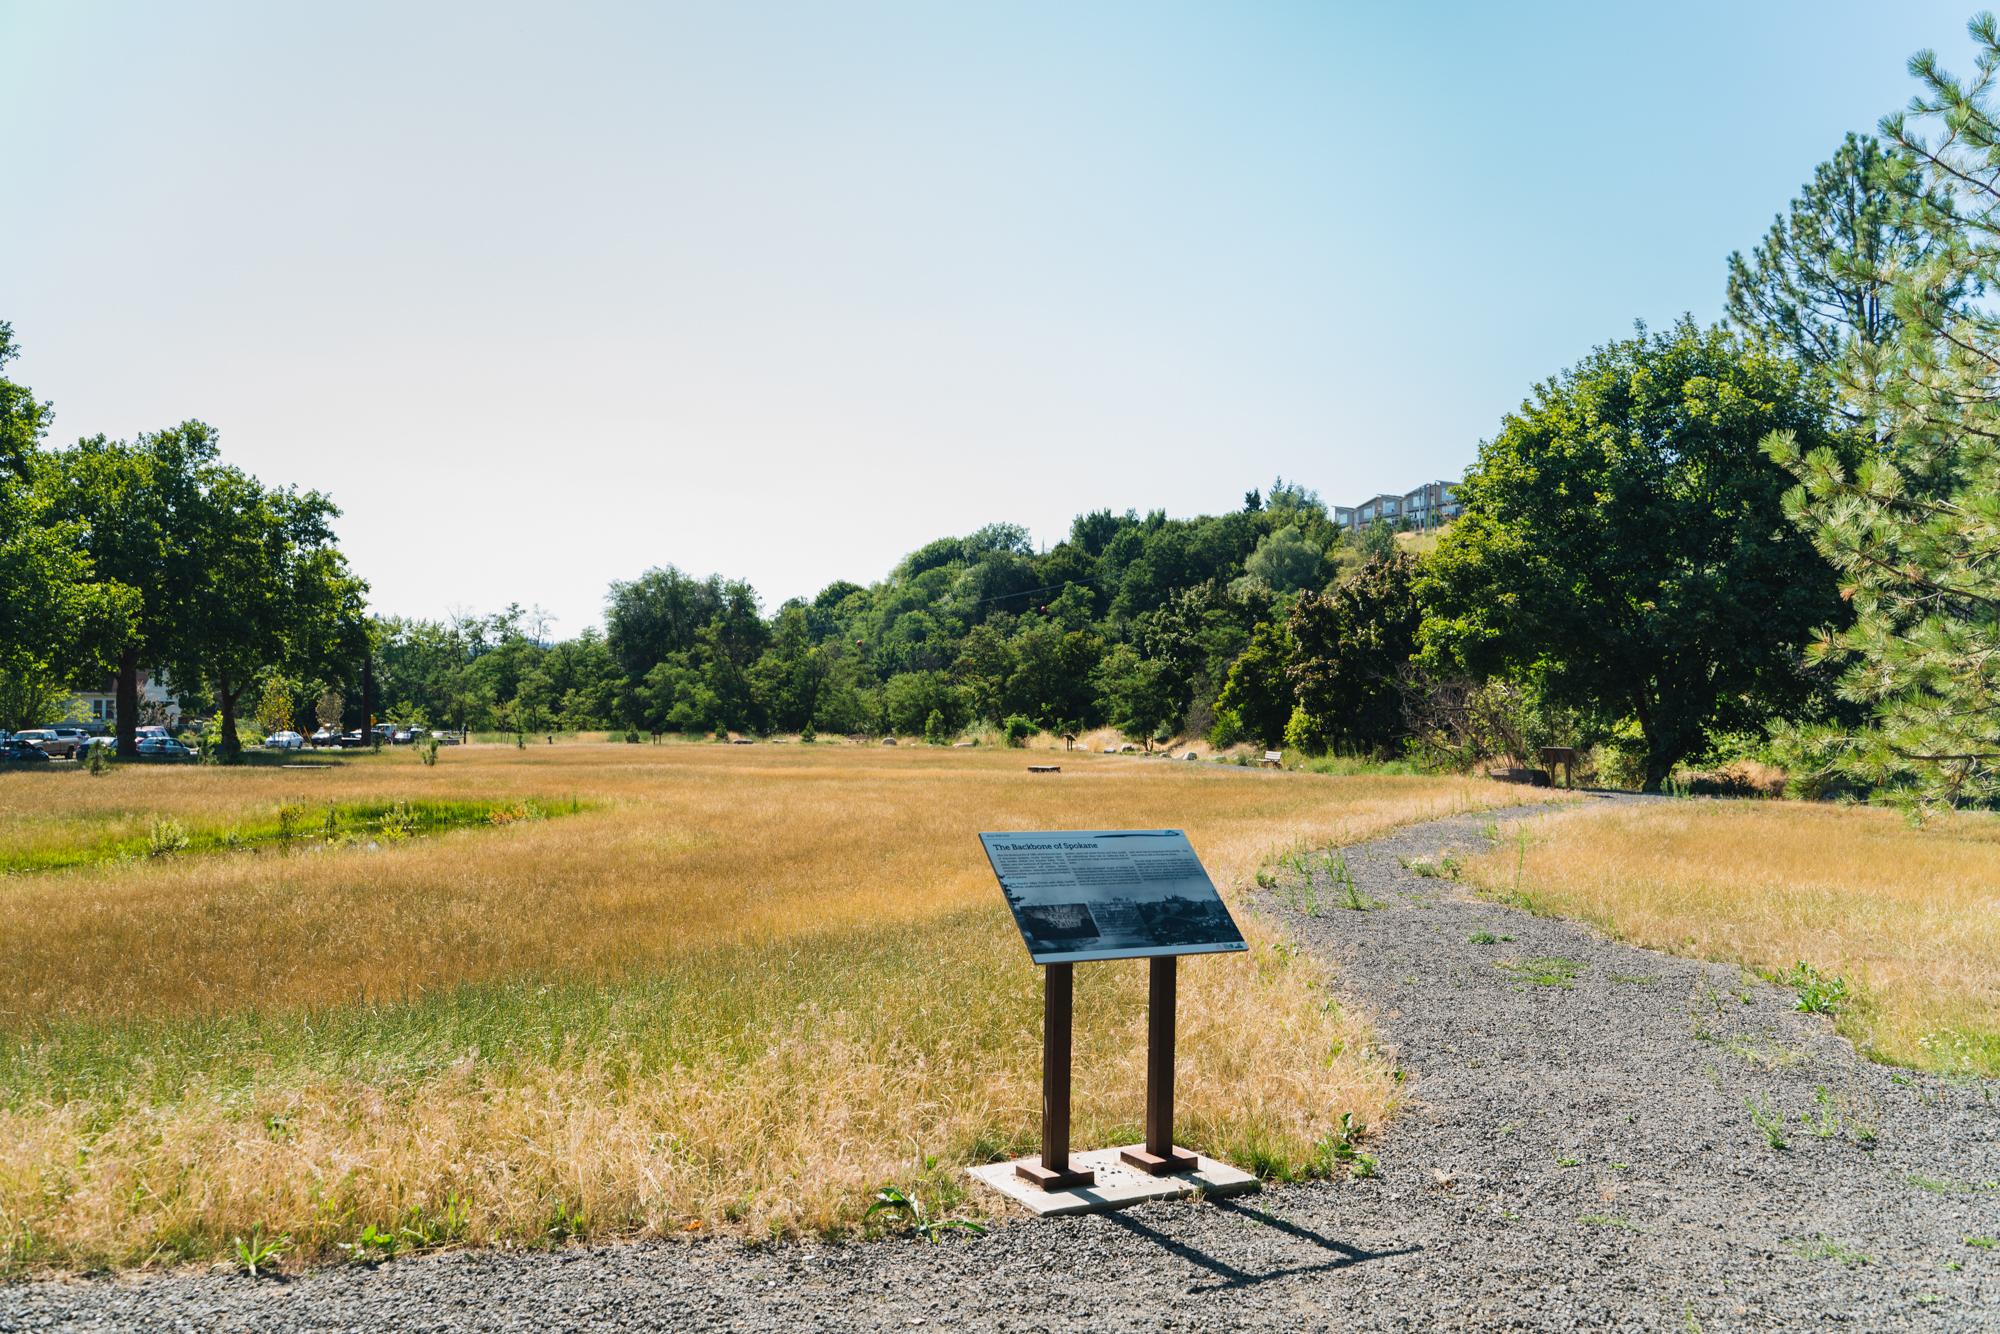 river-gorge-spokane-interpretive-signage-peaceful-valley